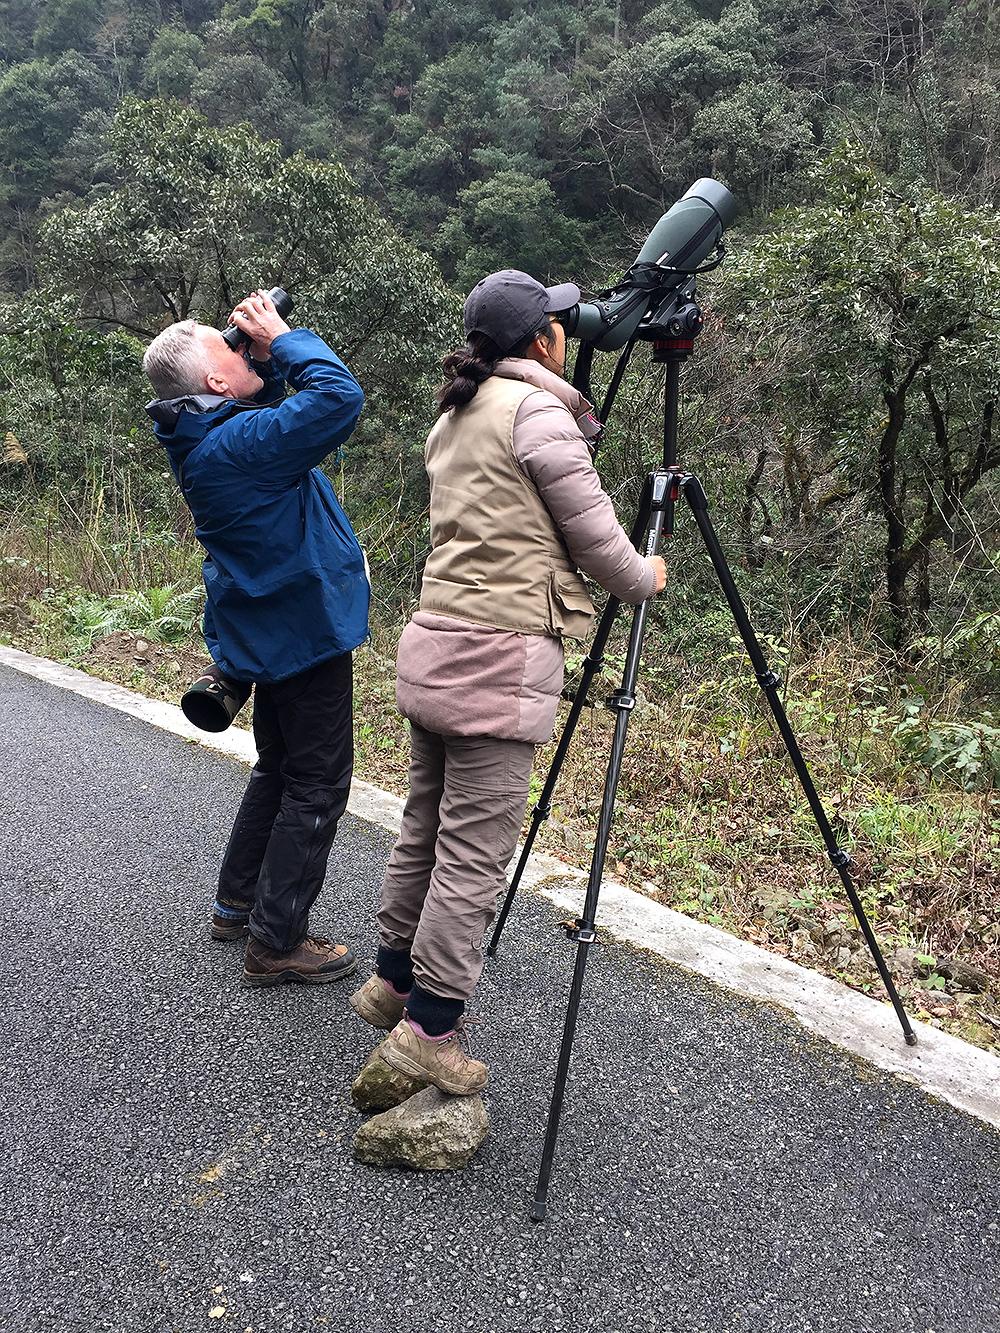 Brian Ivon Jones (L) and Elaine Du viewing Grandala for the first time, Dulong Gorge, 19 Feb. 2016.